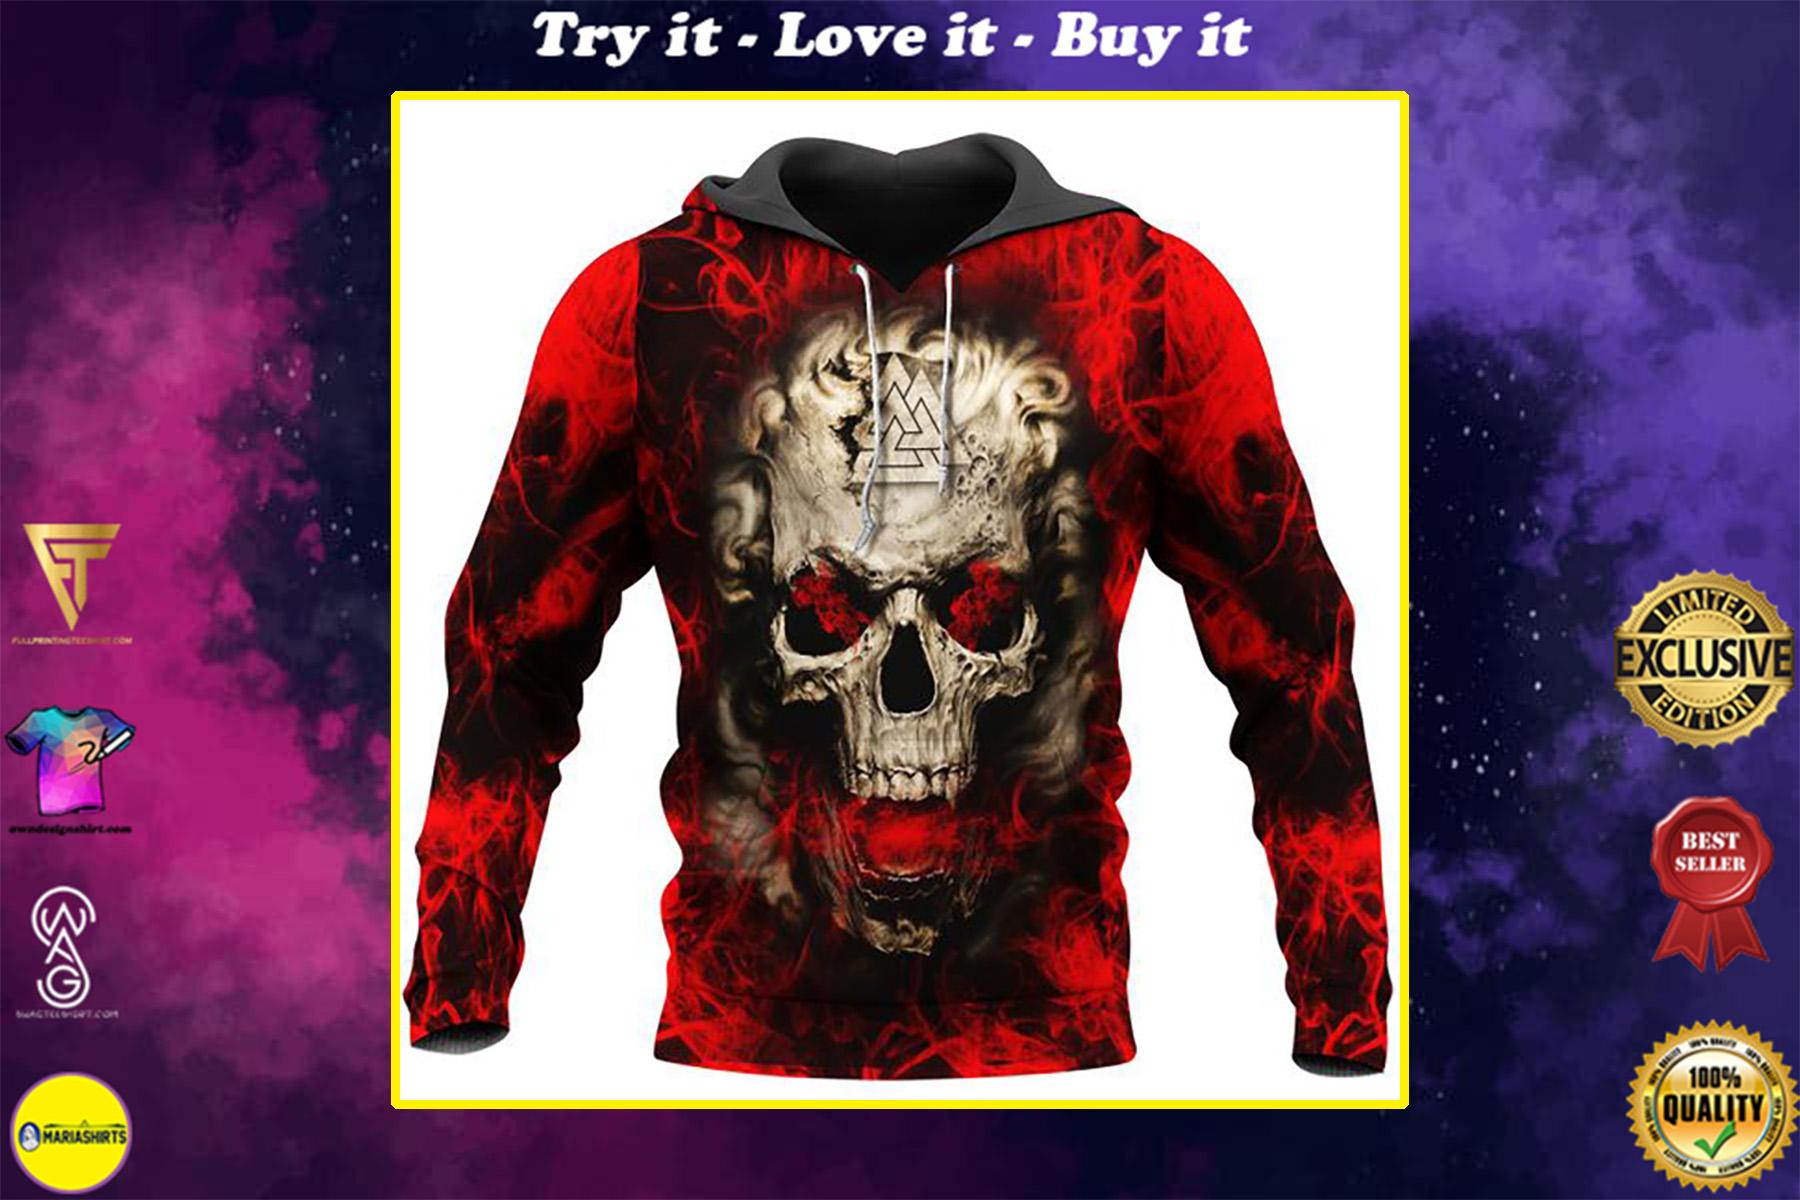 viking skull on fire all over printed shirt